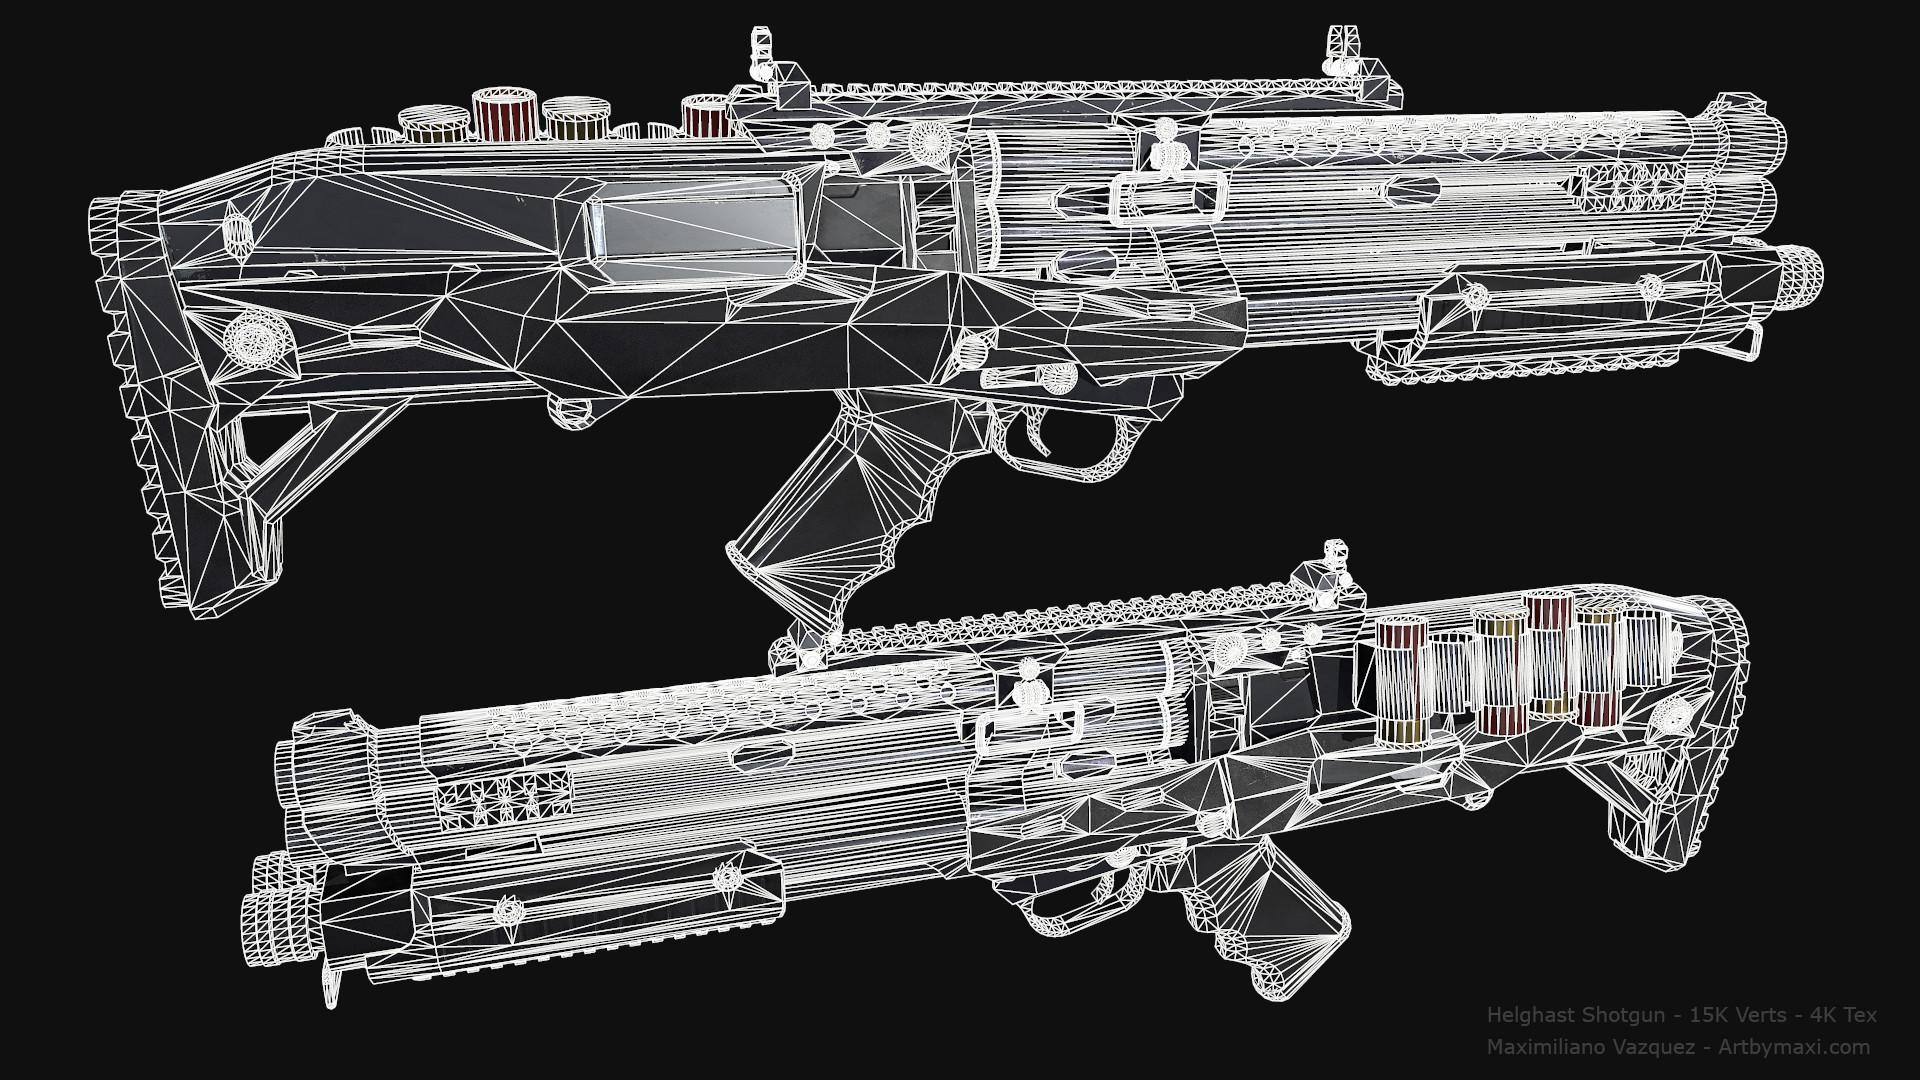 Maximiliano vazquez hellghast shotgun lp13